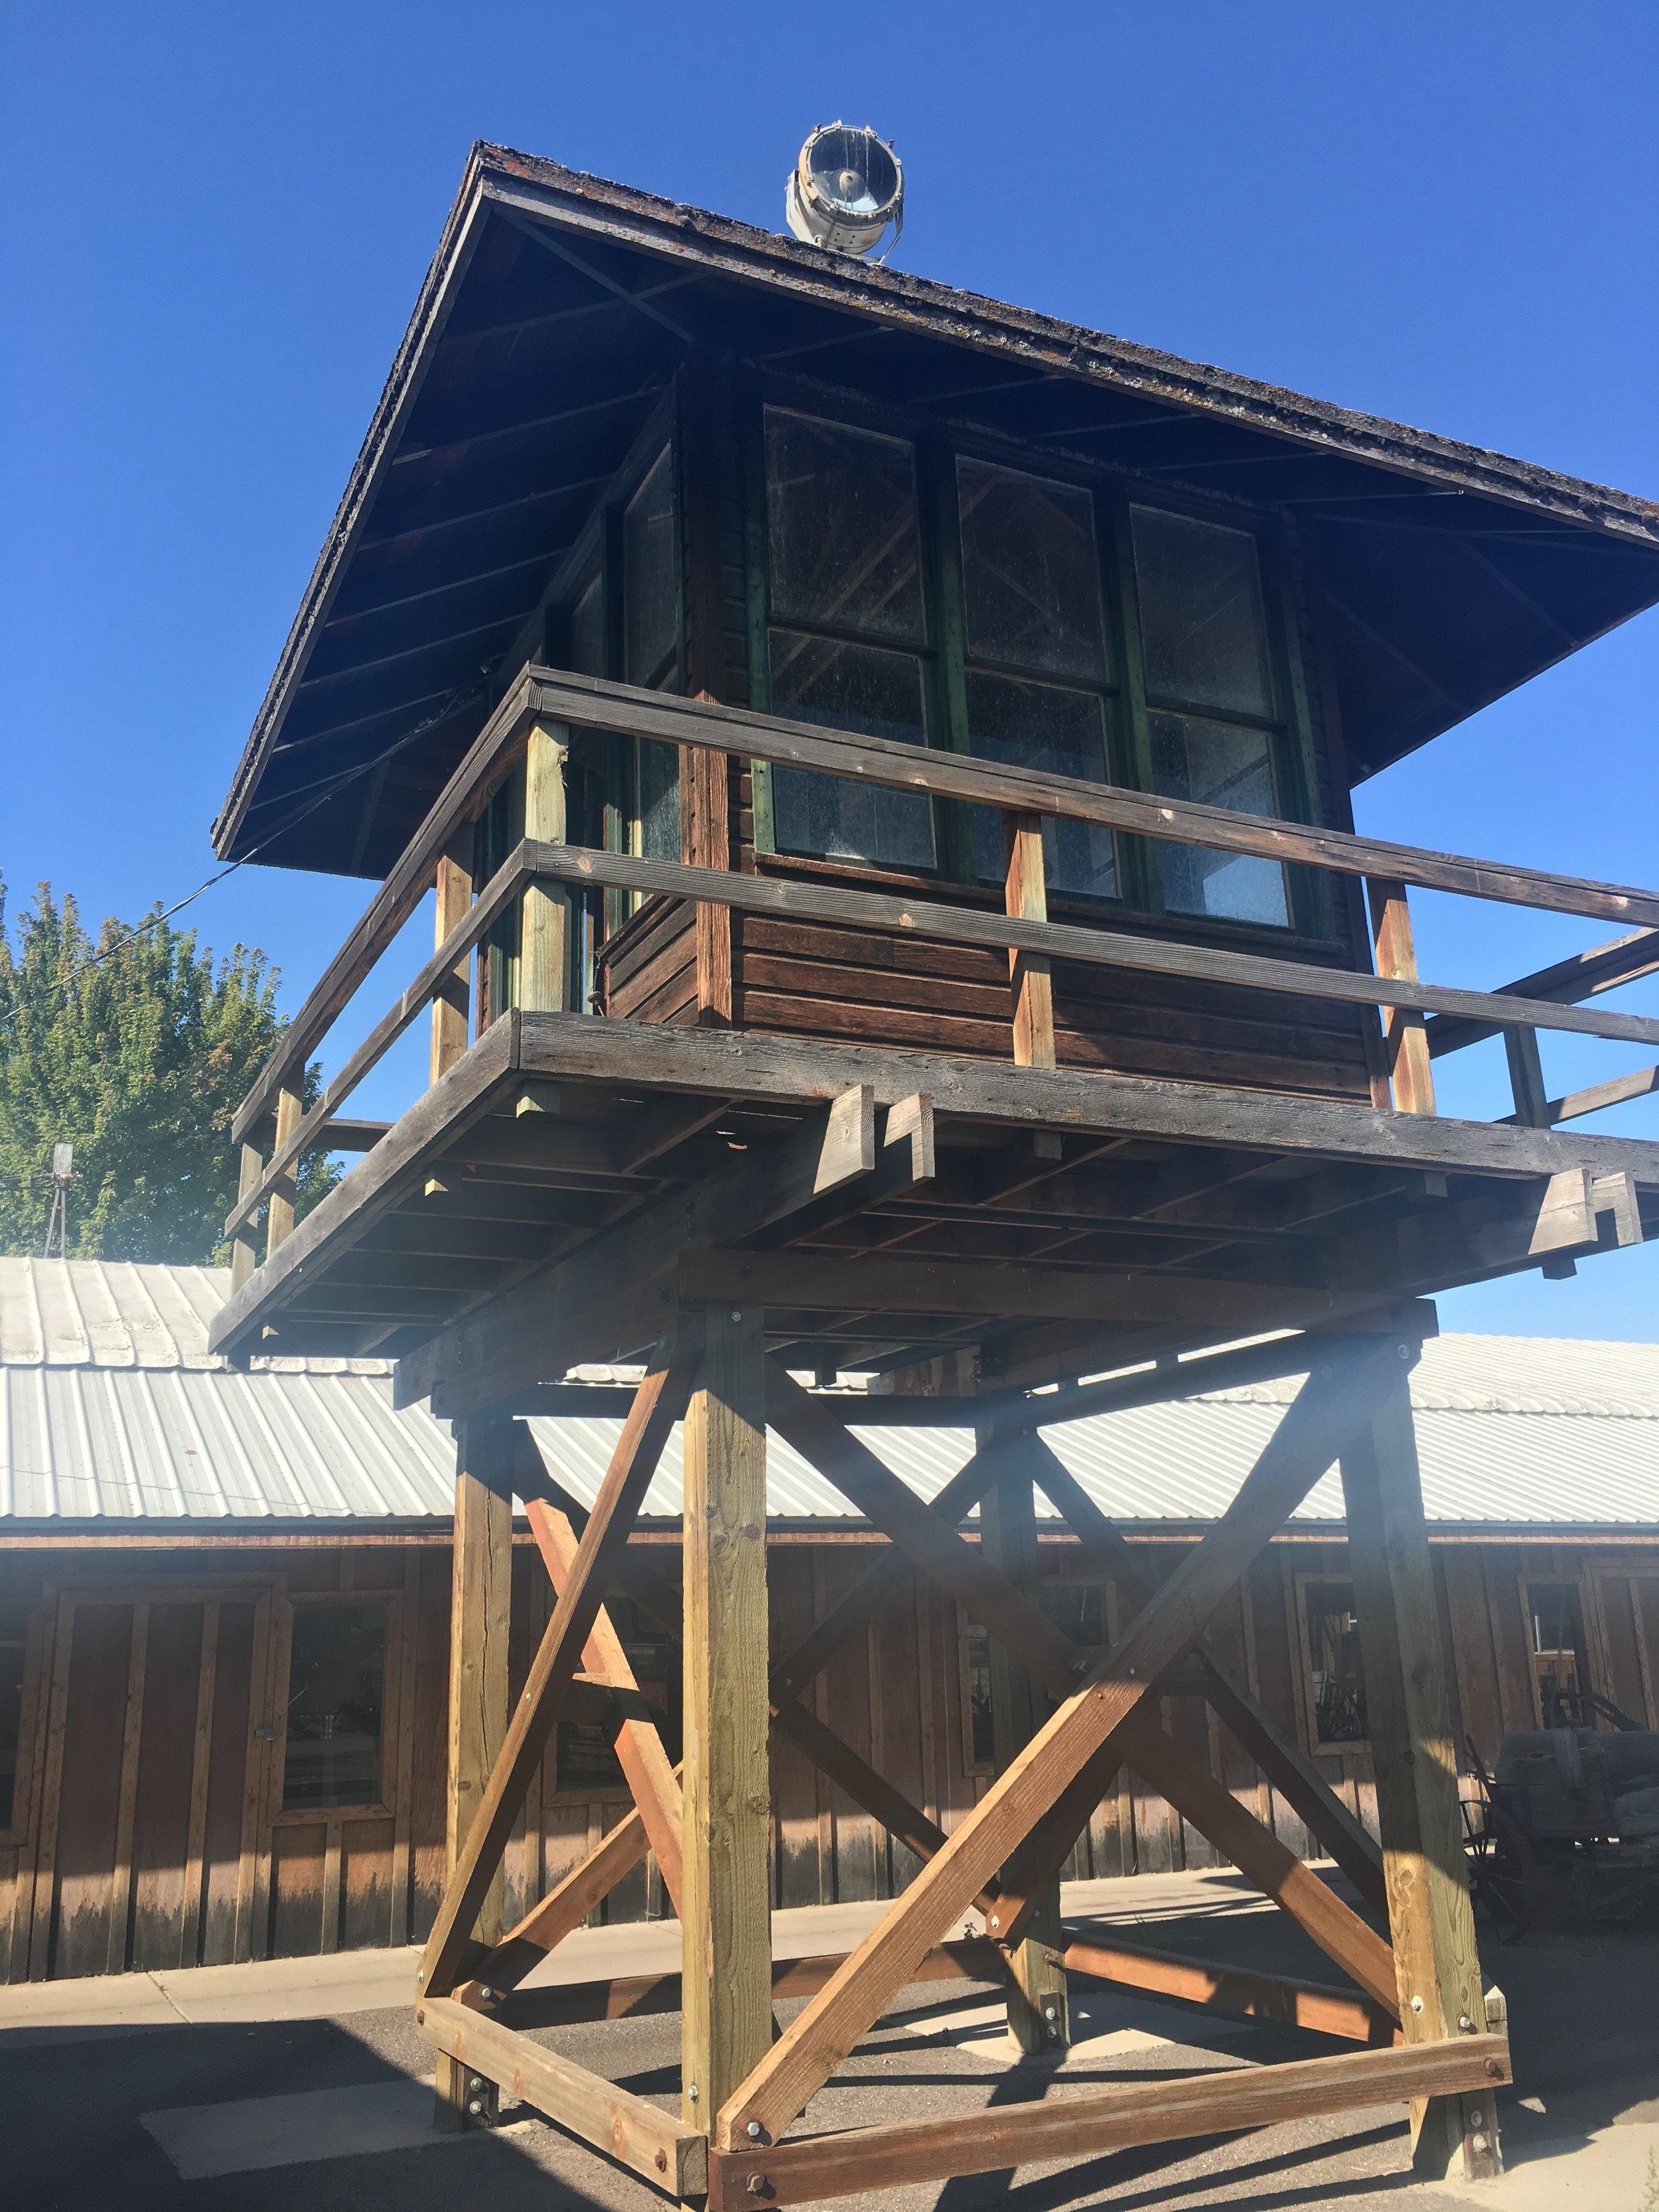 A replica of a Tule Lake guard tower